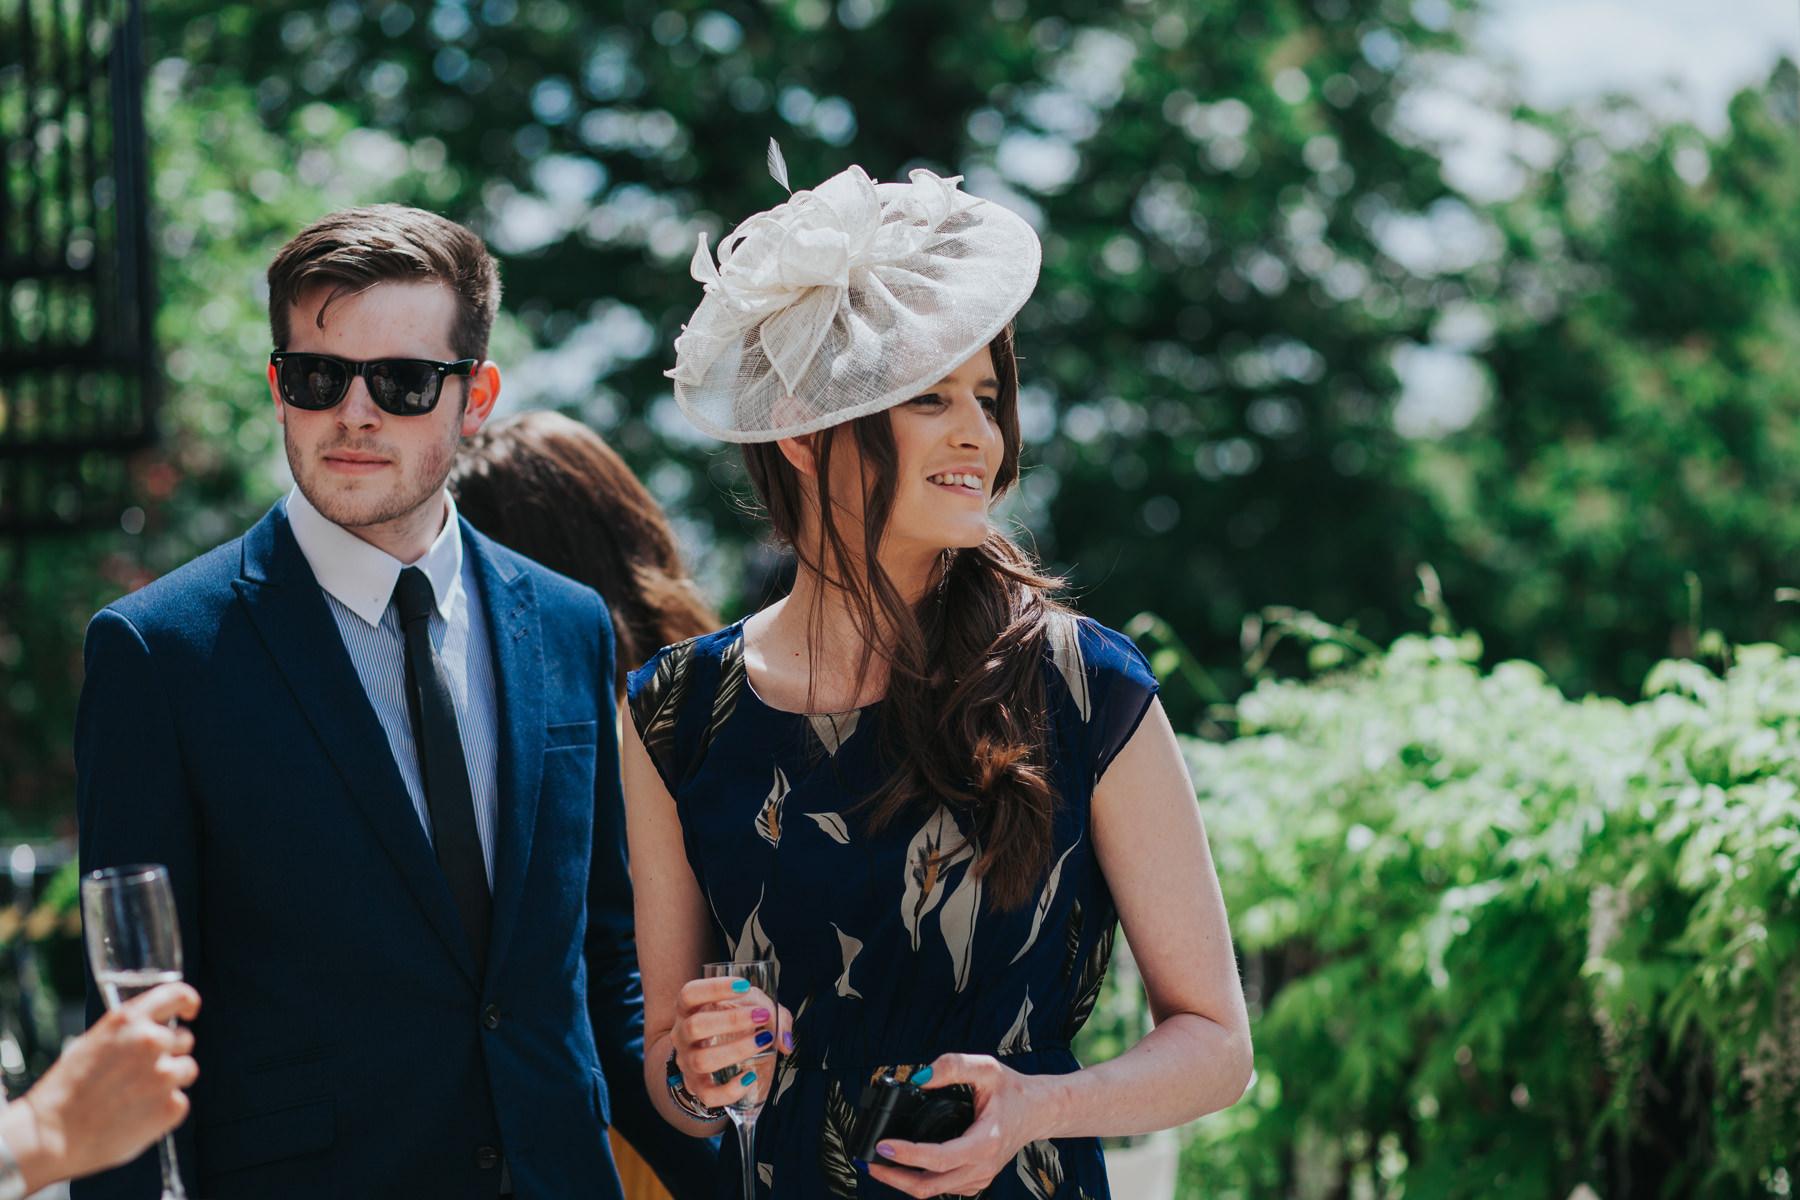 CRL-271-The Bingham wedding Richmond-reportage guest candid photographer.jpg